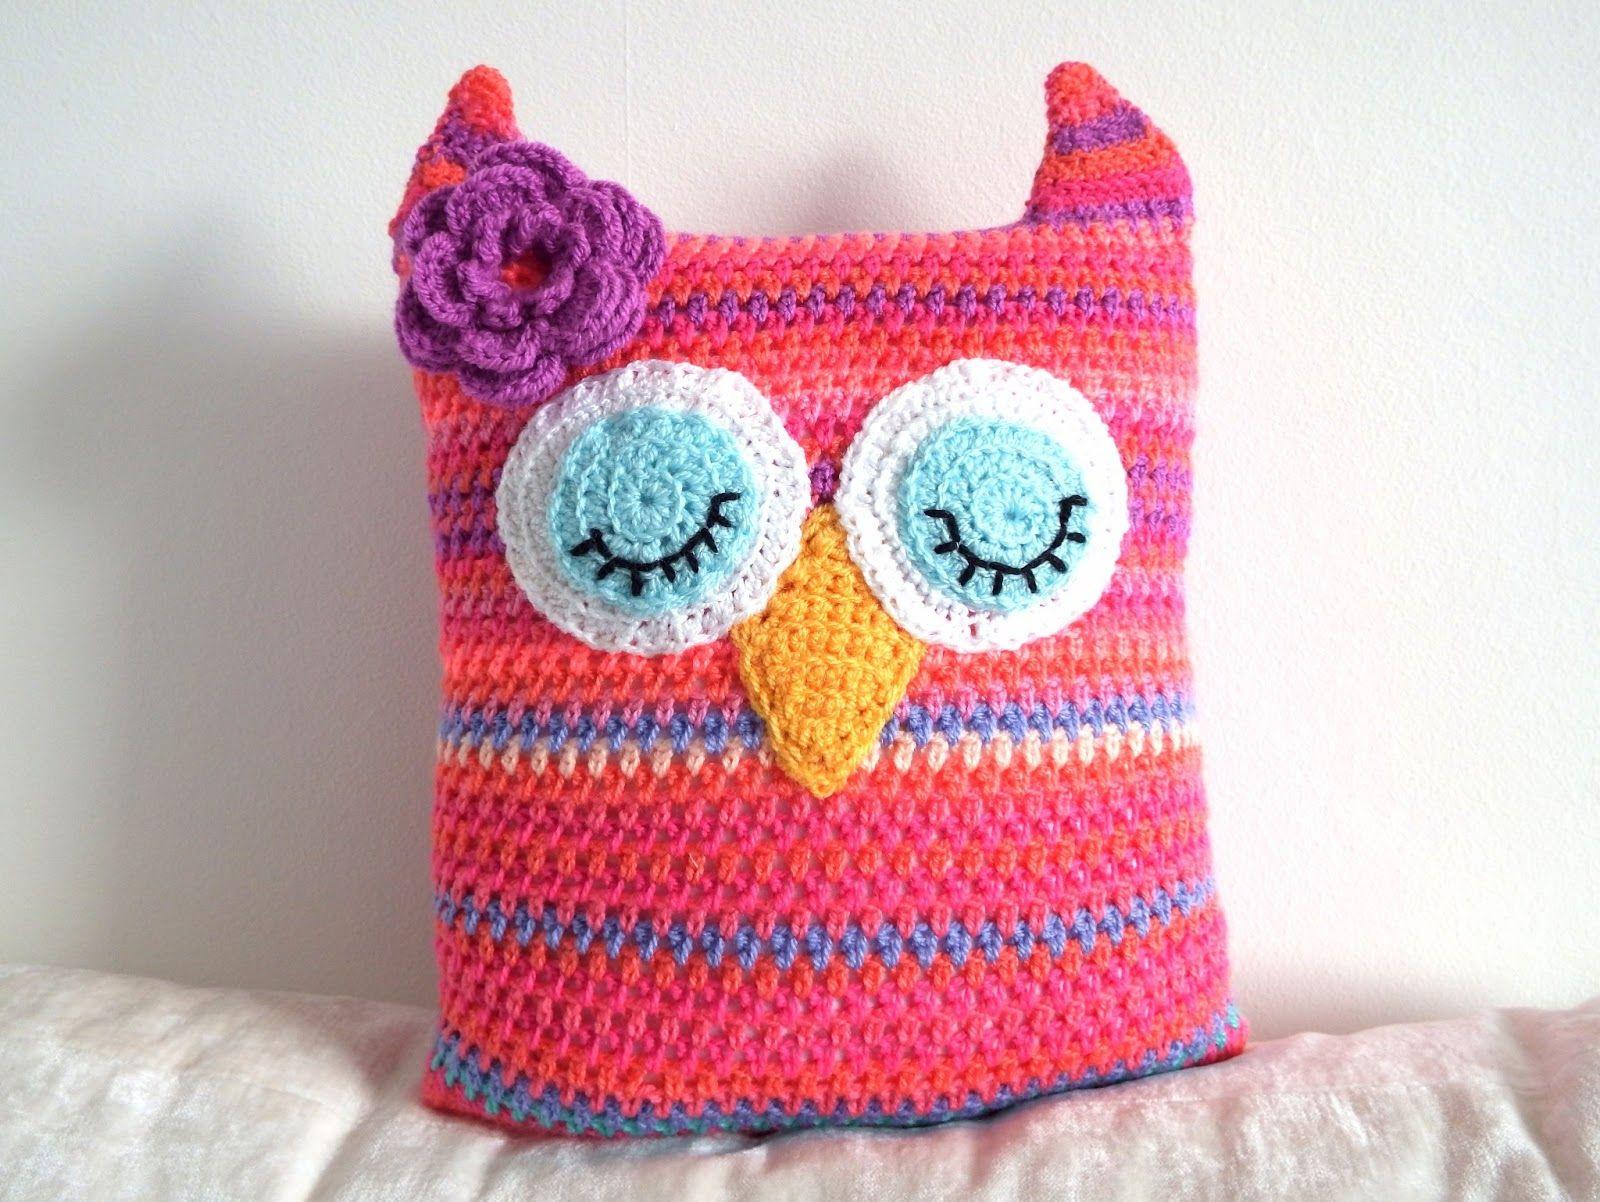 Amigurumi Vivi Free Patterns : Alice owl doorstop or pillow by andrea free crochet pattern